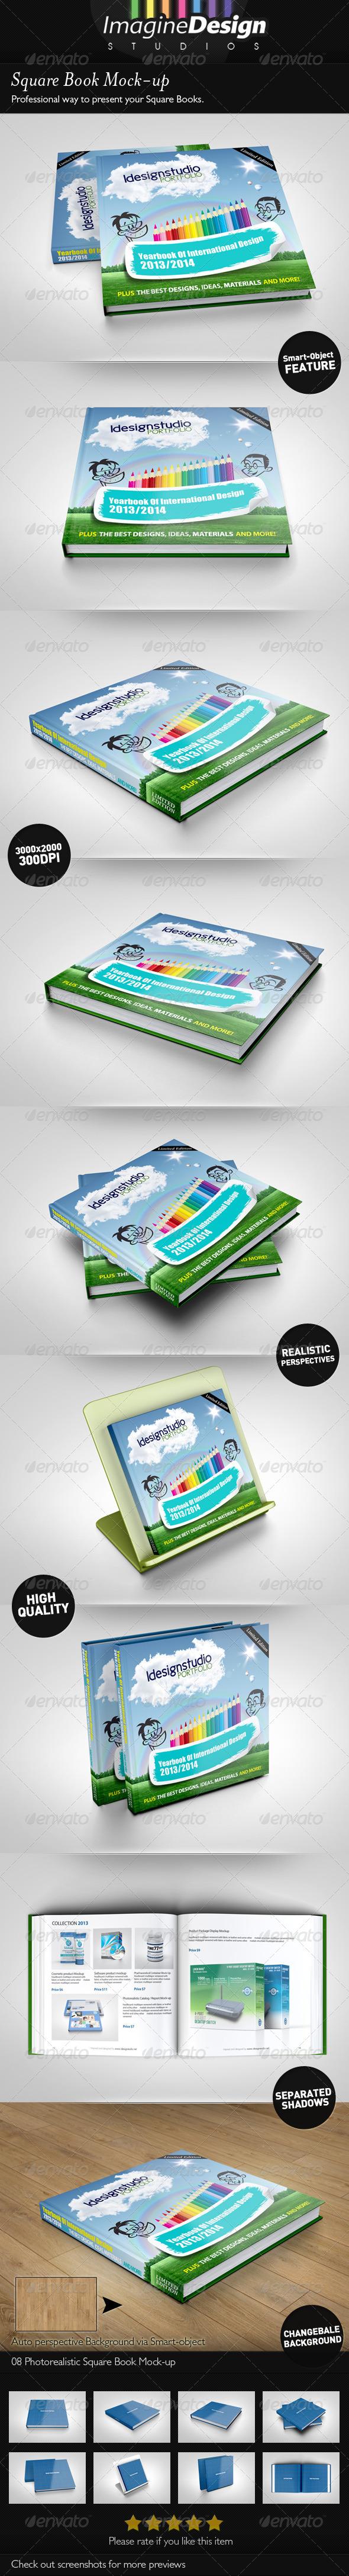 GraphicRiver Square Book Mock-up 4559056